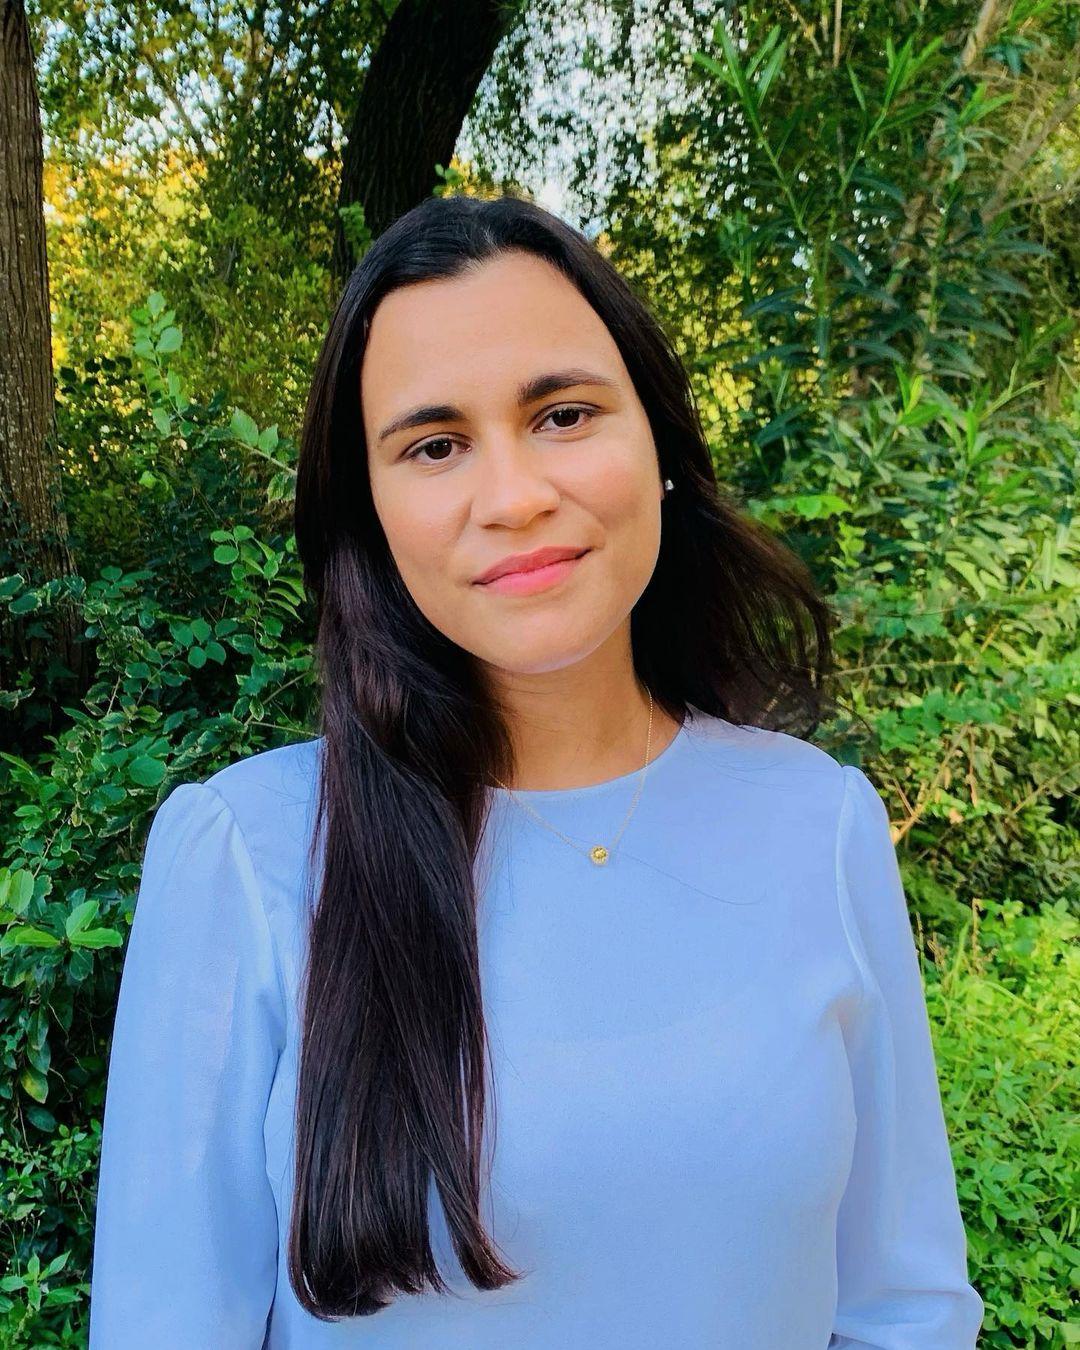 Rita Tapadinhas, Plant a Choice